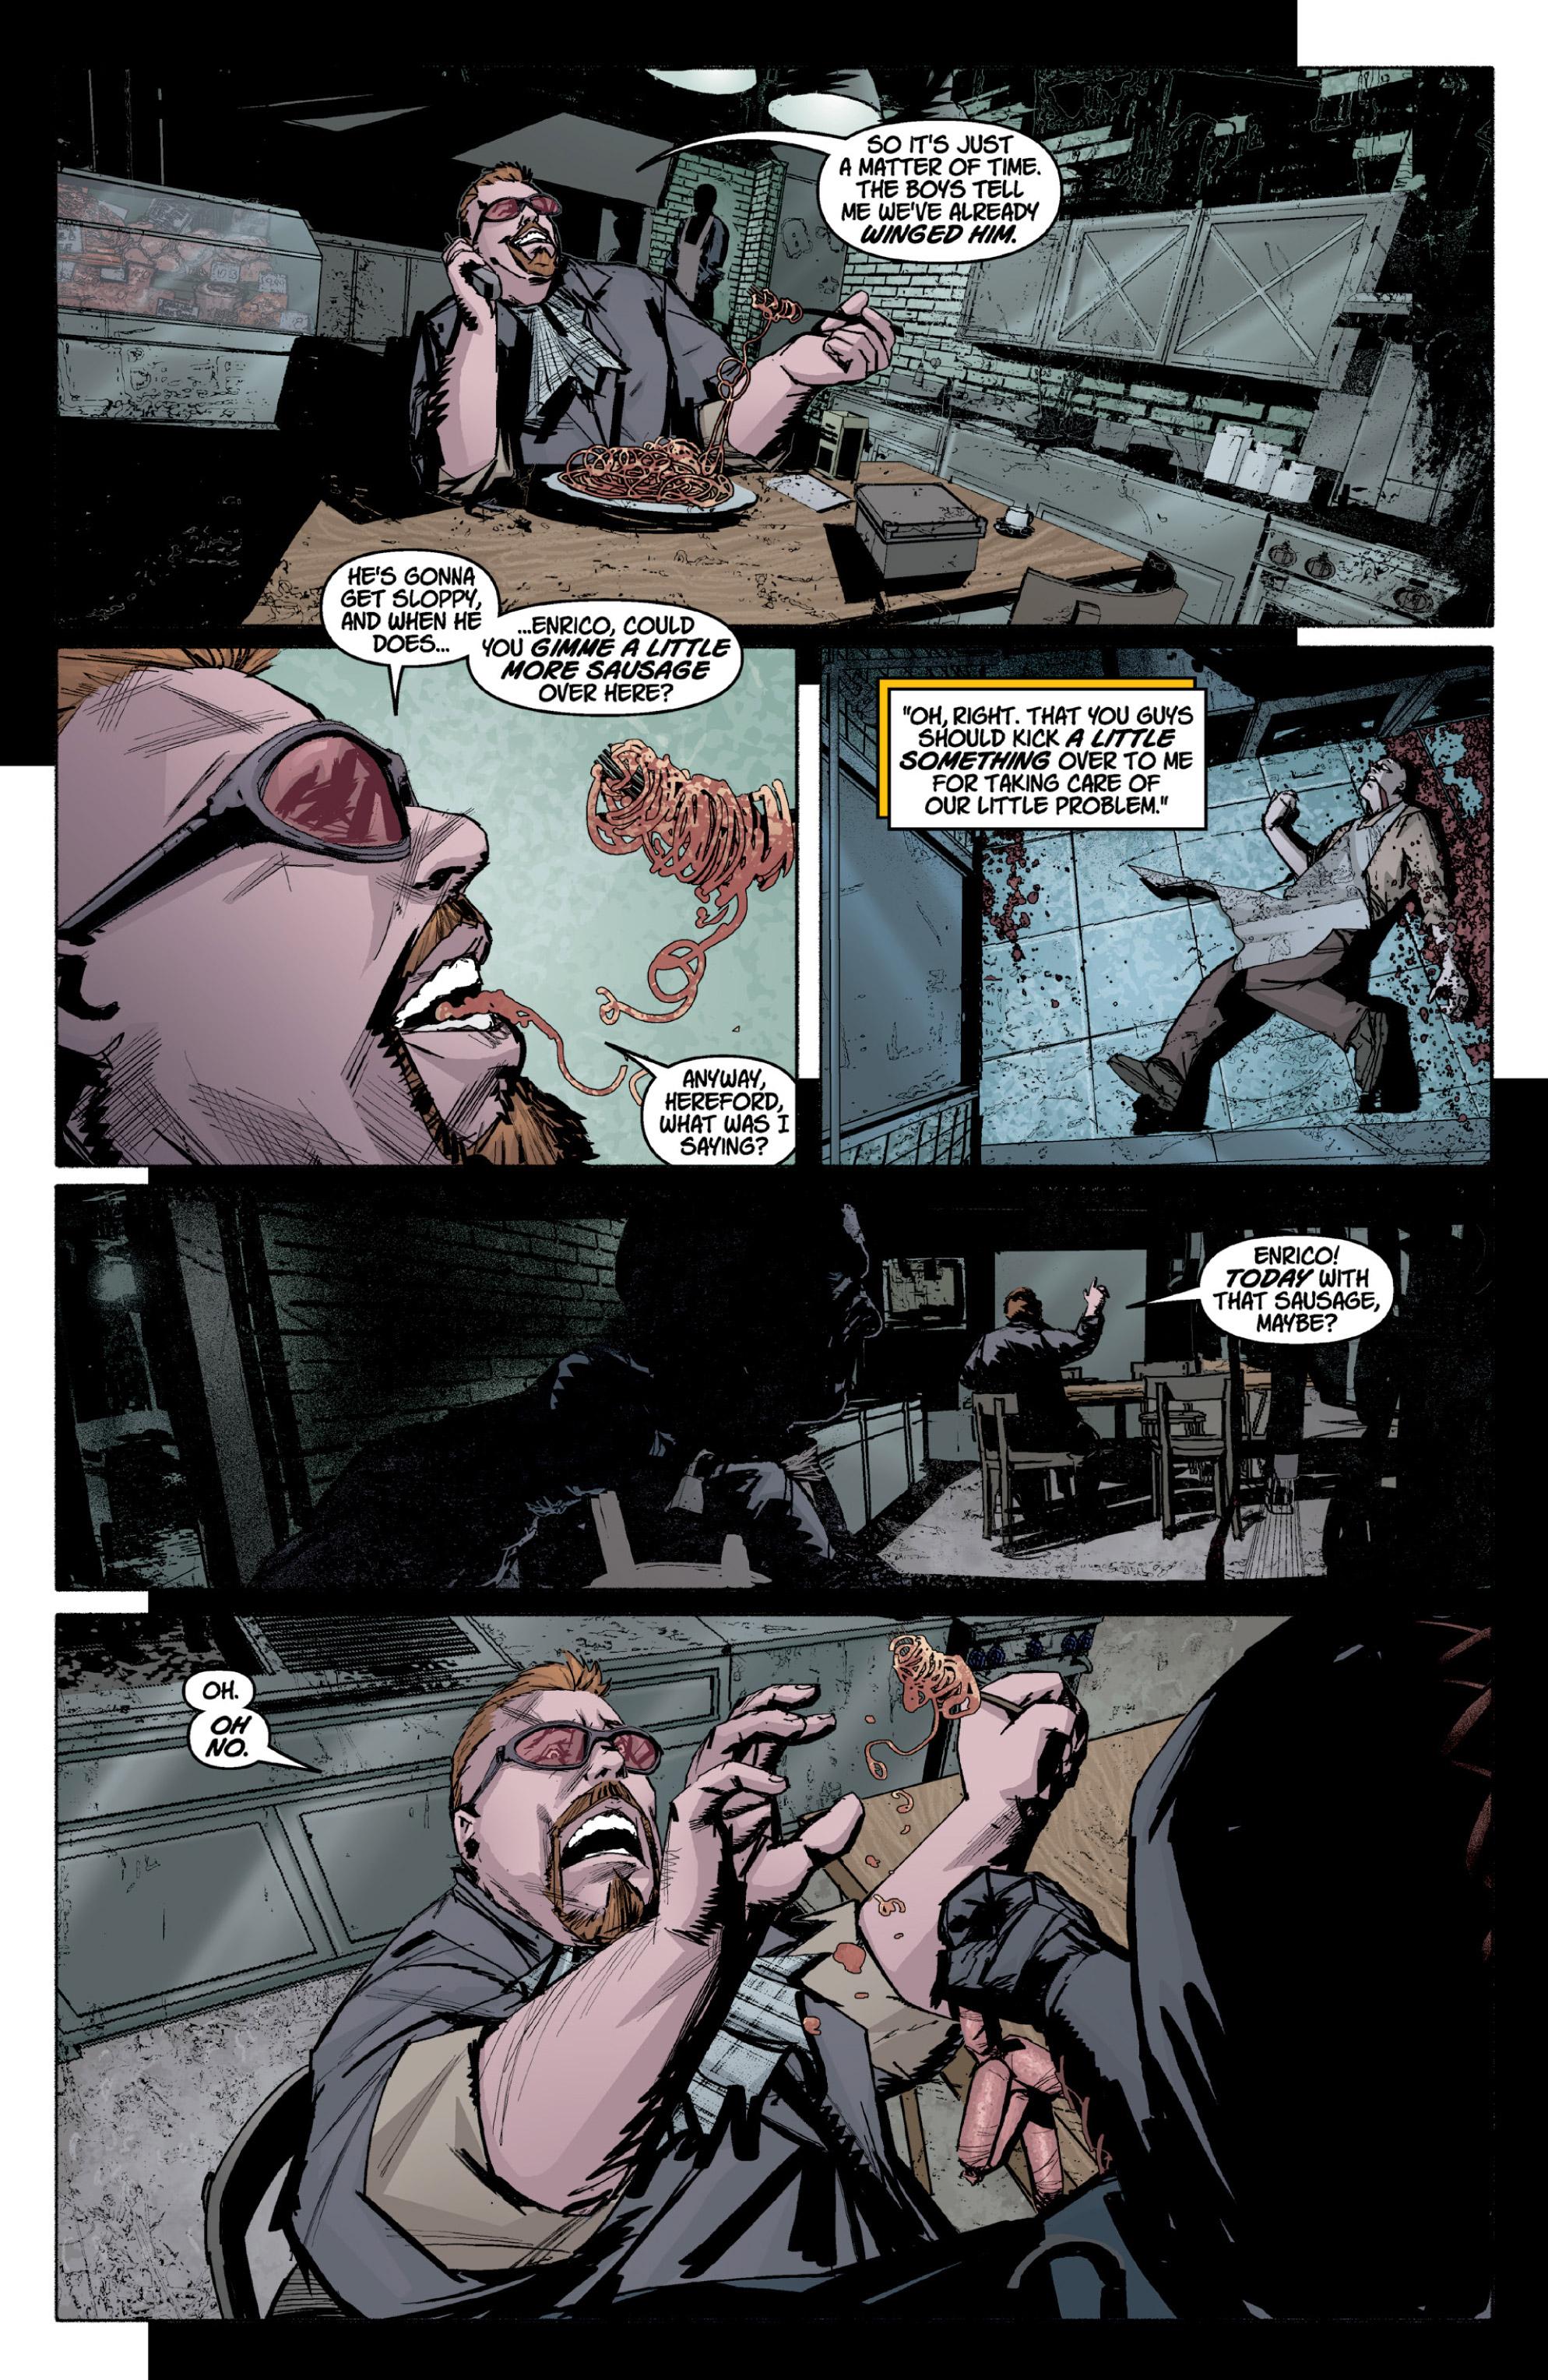 Read online X: Big Bad comic -  Issue # Full - 14